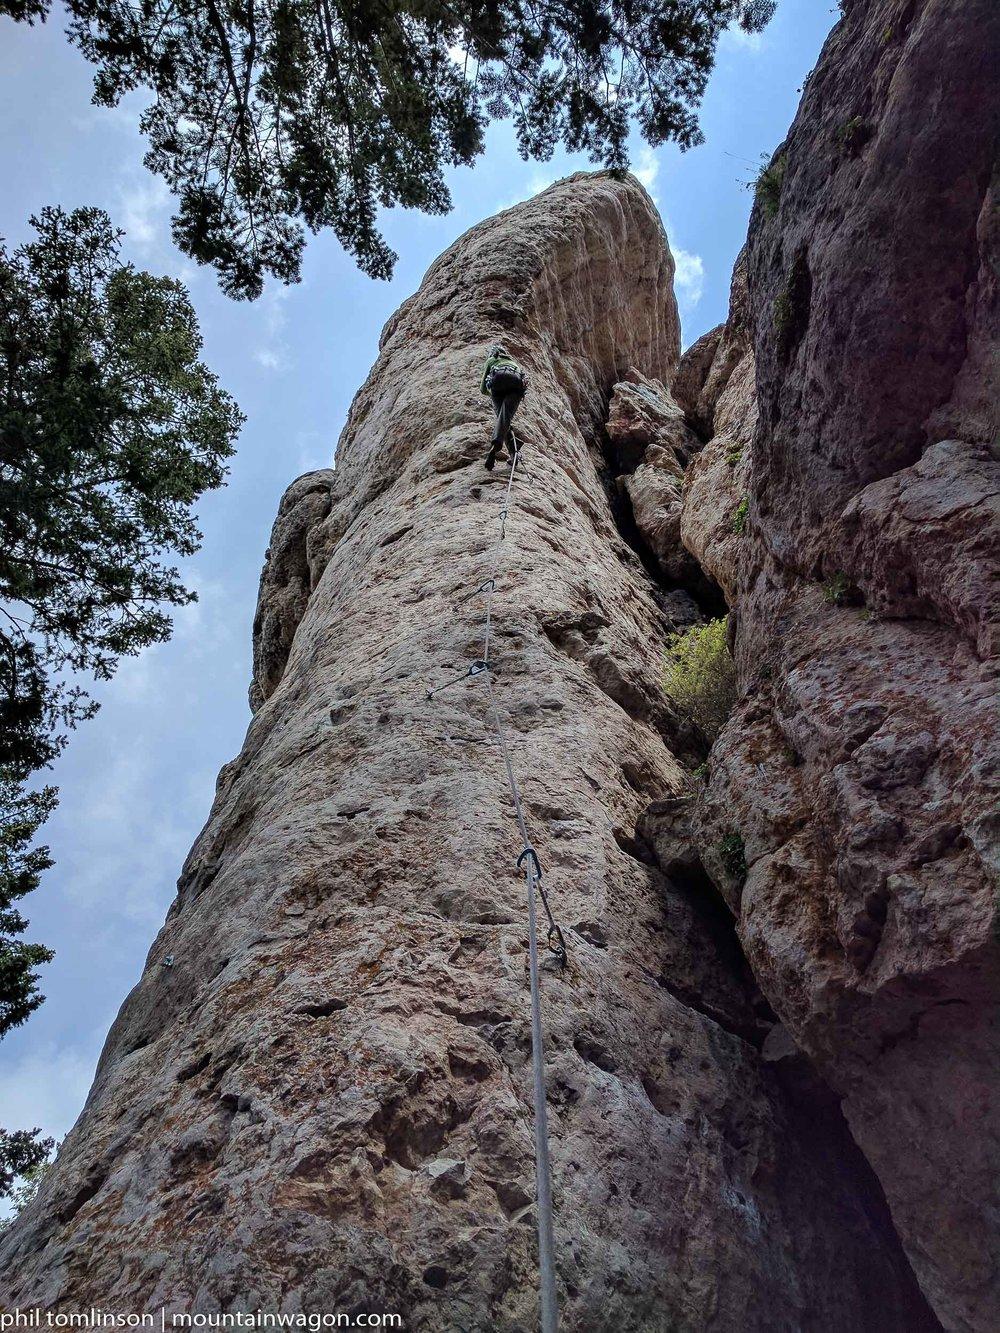 Climbing the Cobra at Ten Sleep, Wyoming